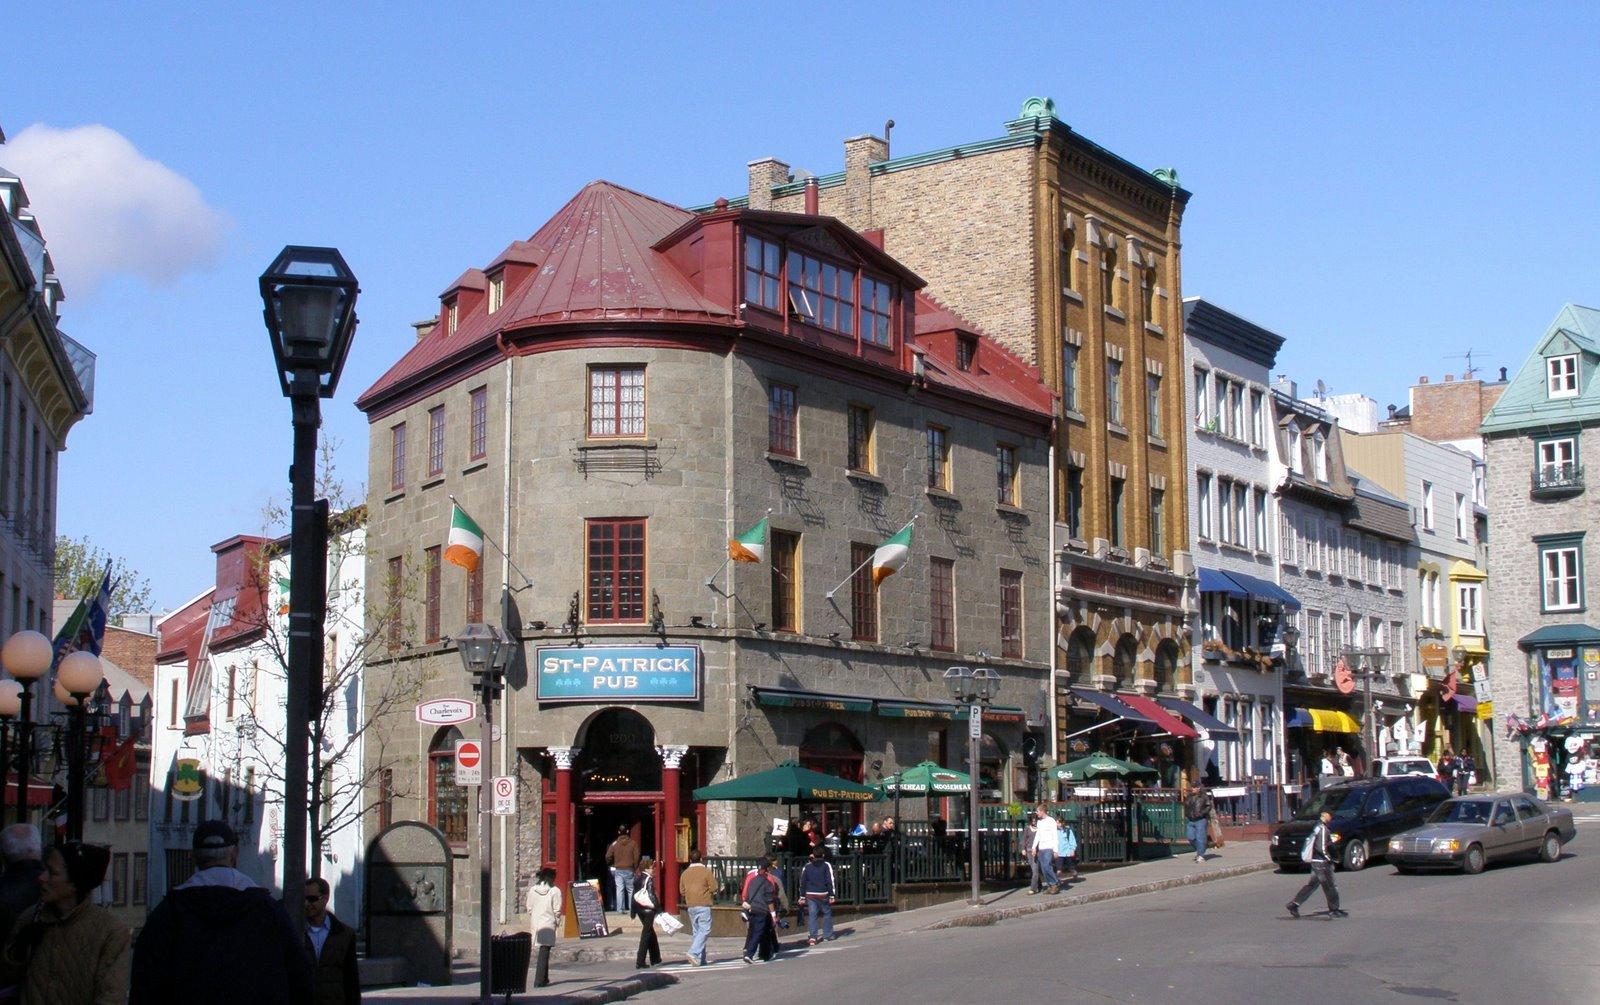 pub st patrick, rue garneau, quebec city